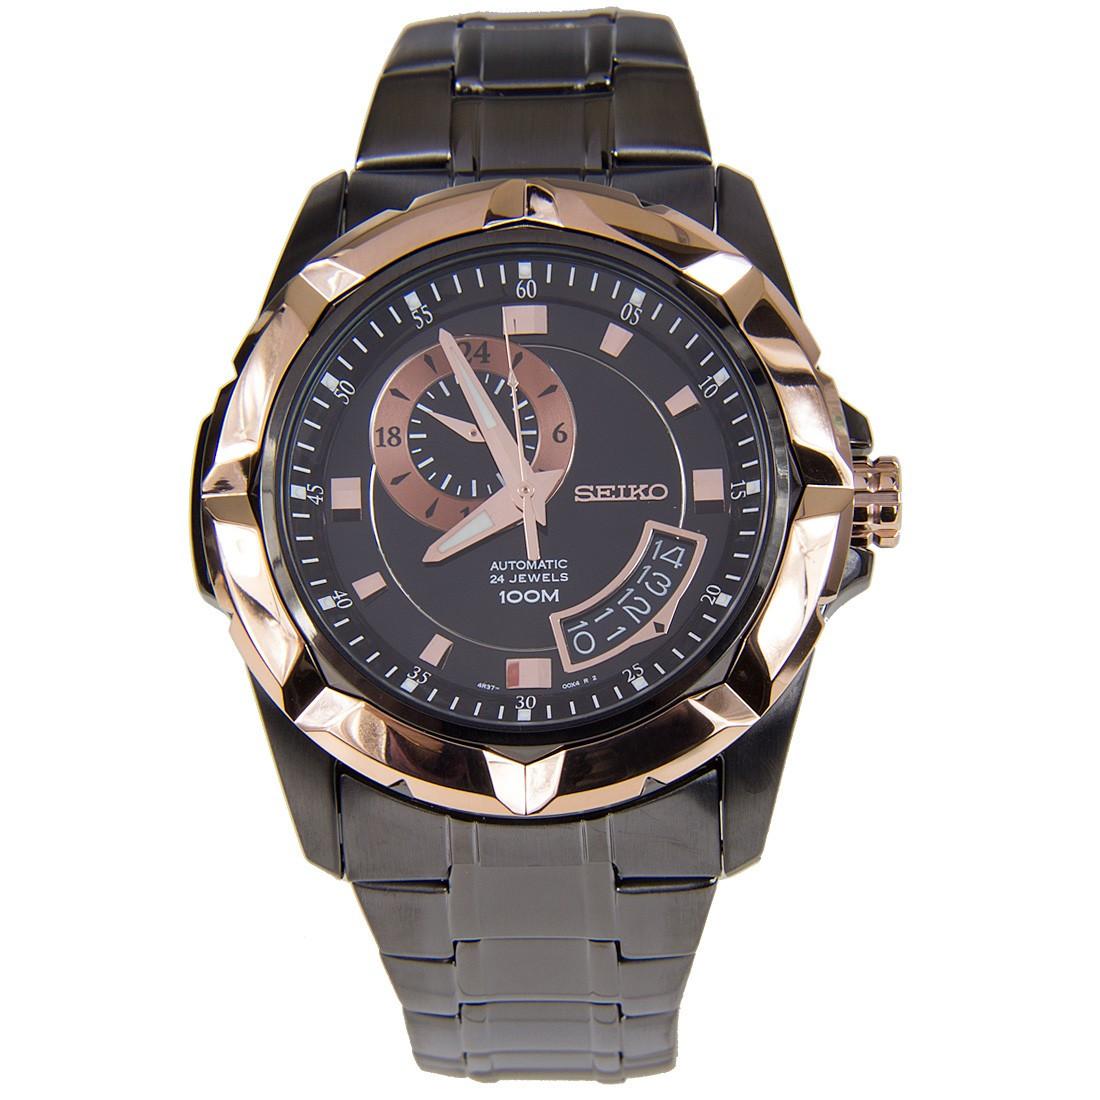 Часы Seiko SSA228K1 Automatic 4R37